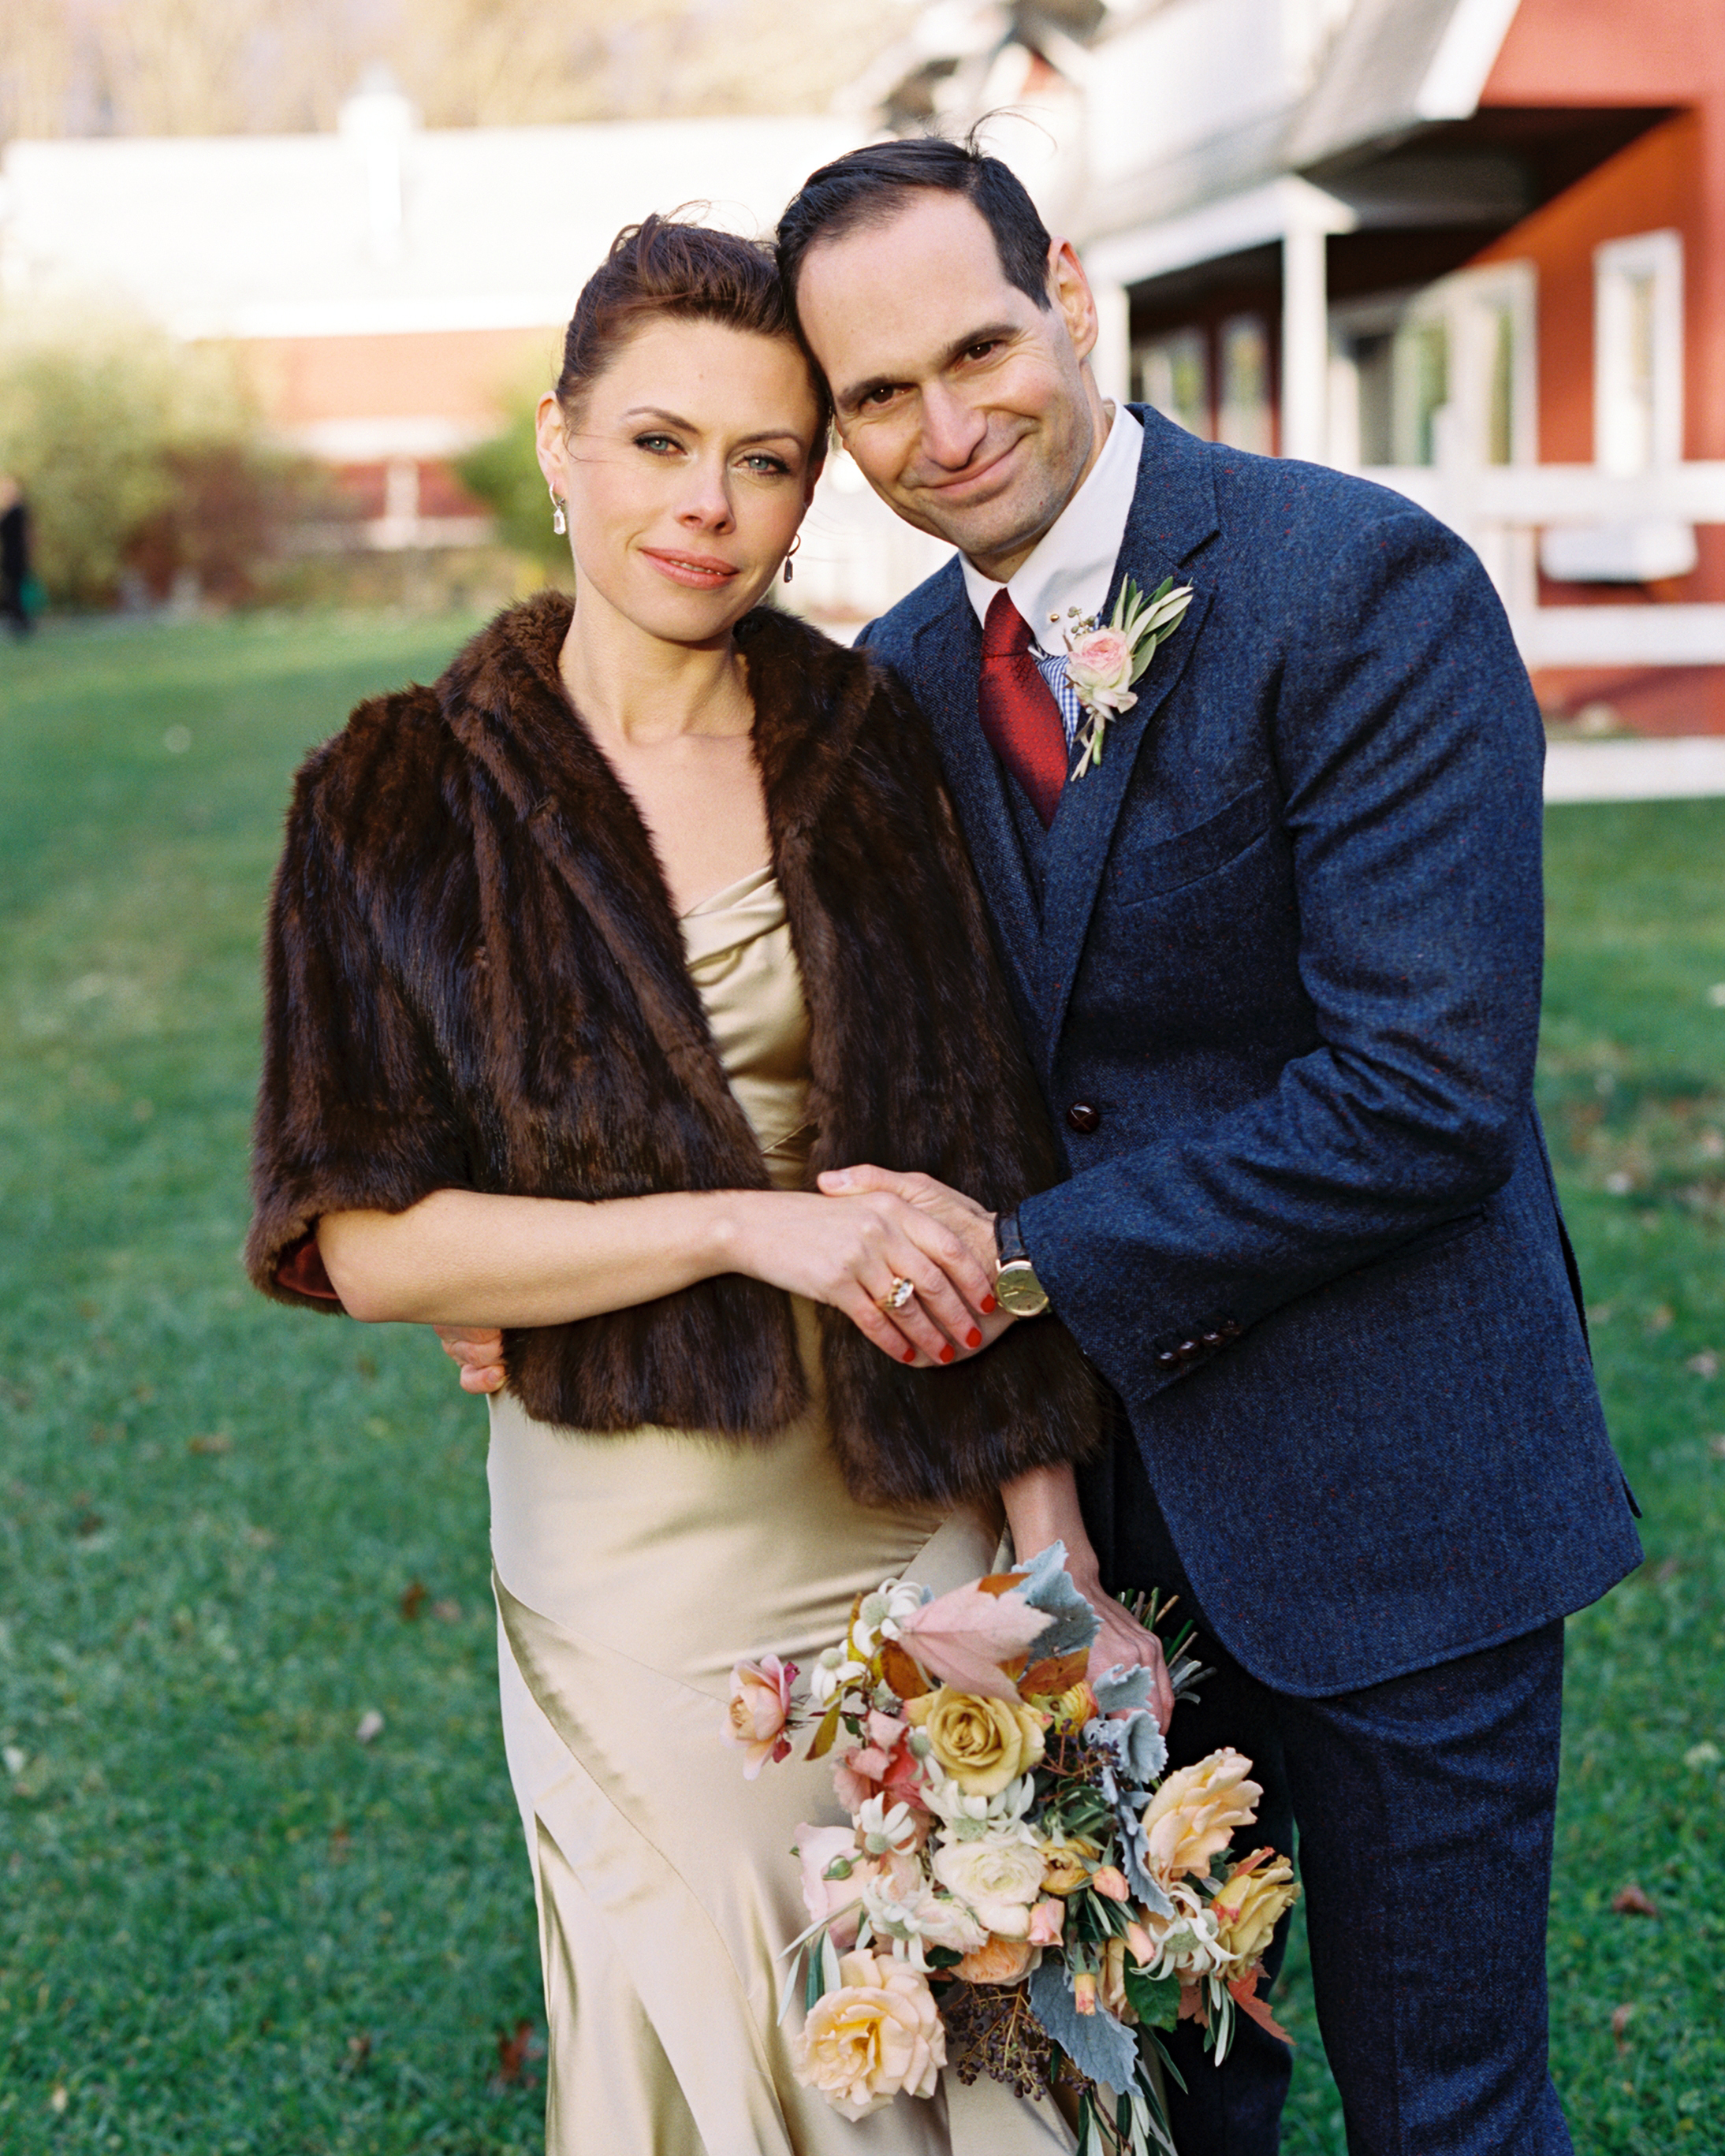 hanna-jimm-wedding-couple-film43-s111413-0814.jpg